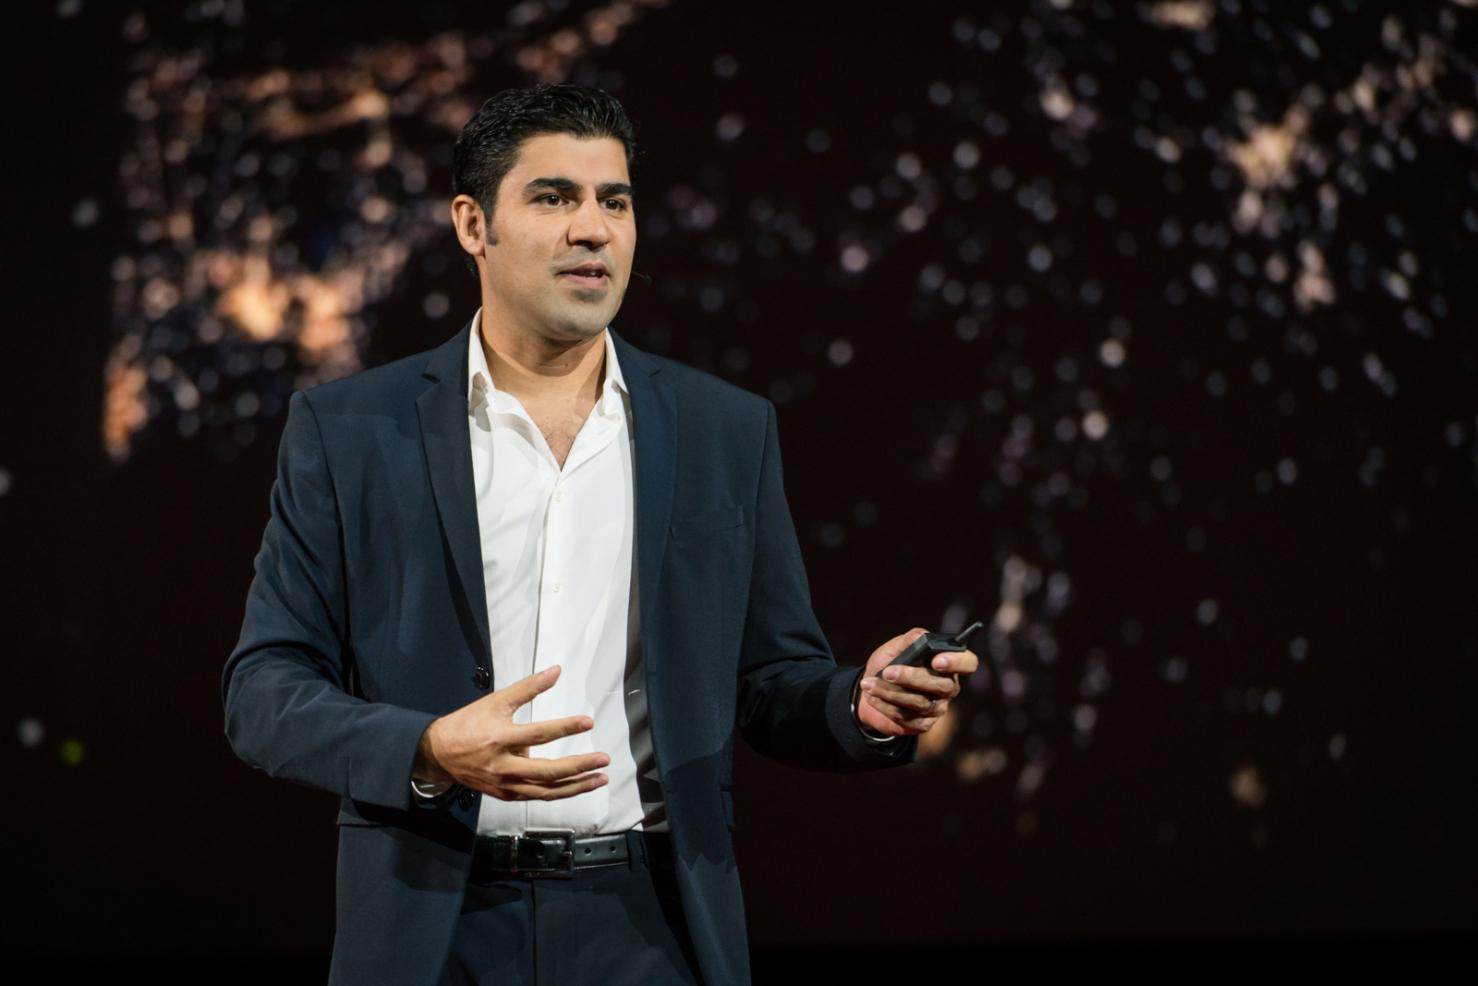 Parag Khanna Author Keynote Speaker at TED Talk 2016